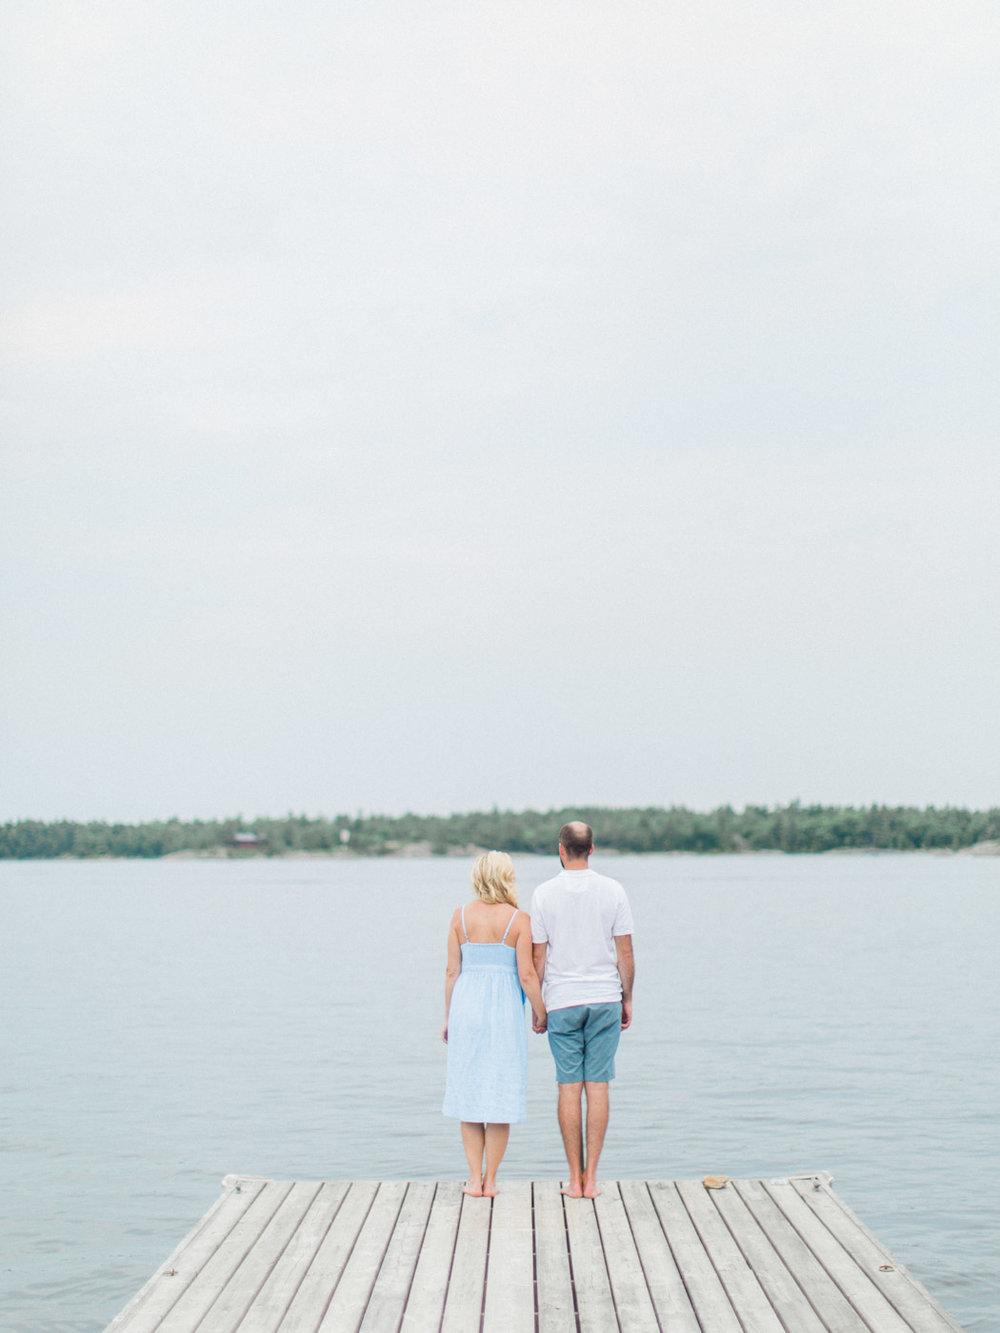 Toronto Wedding Photographer Engagement Photographs at a Georgian Bay Island Cottage